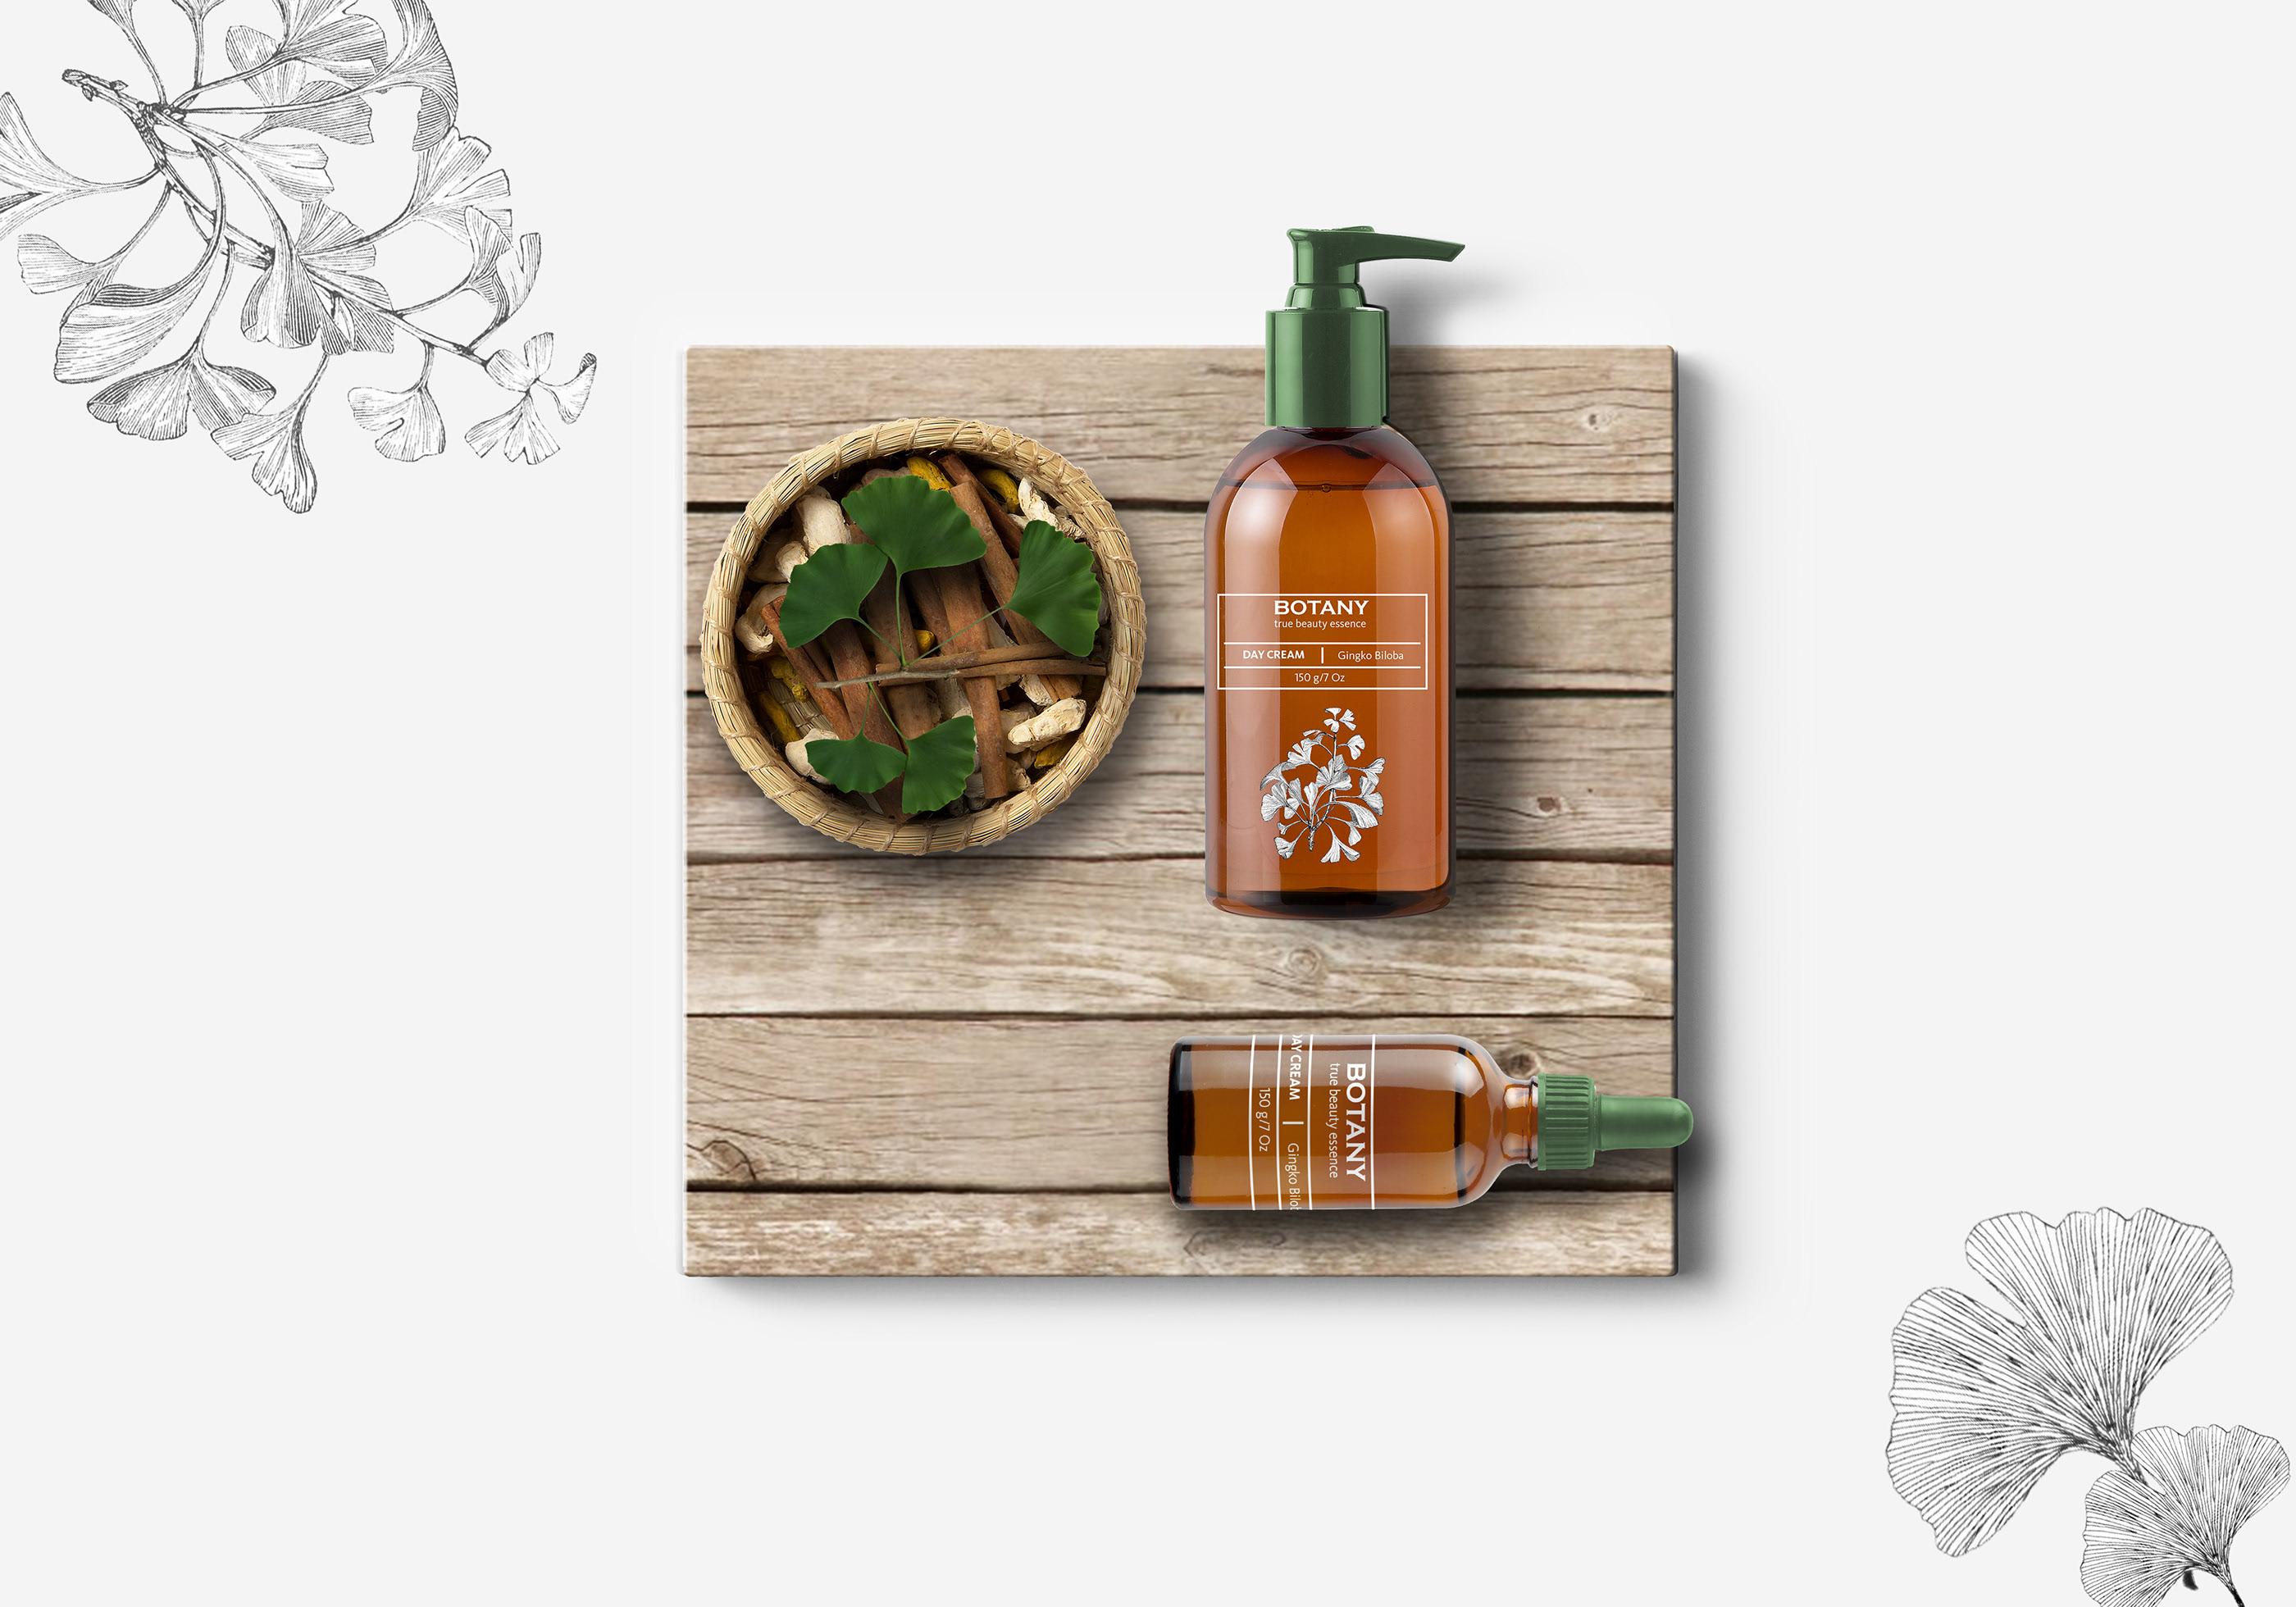 Botany косметика купить catalog-avon.ru